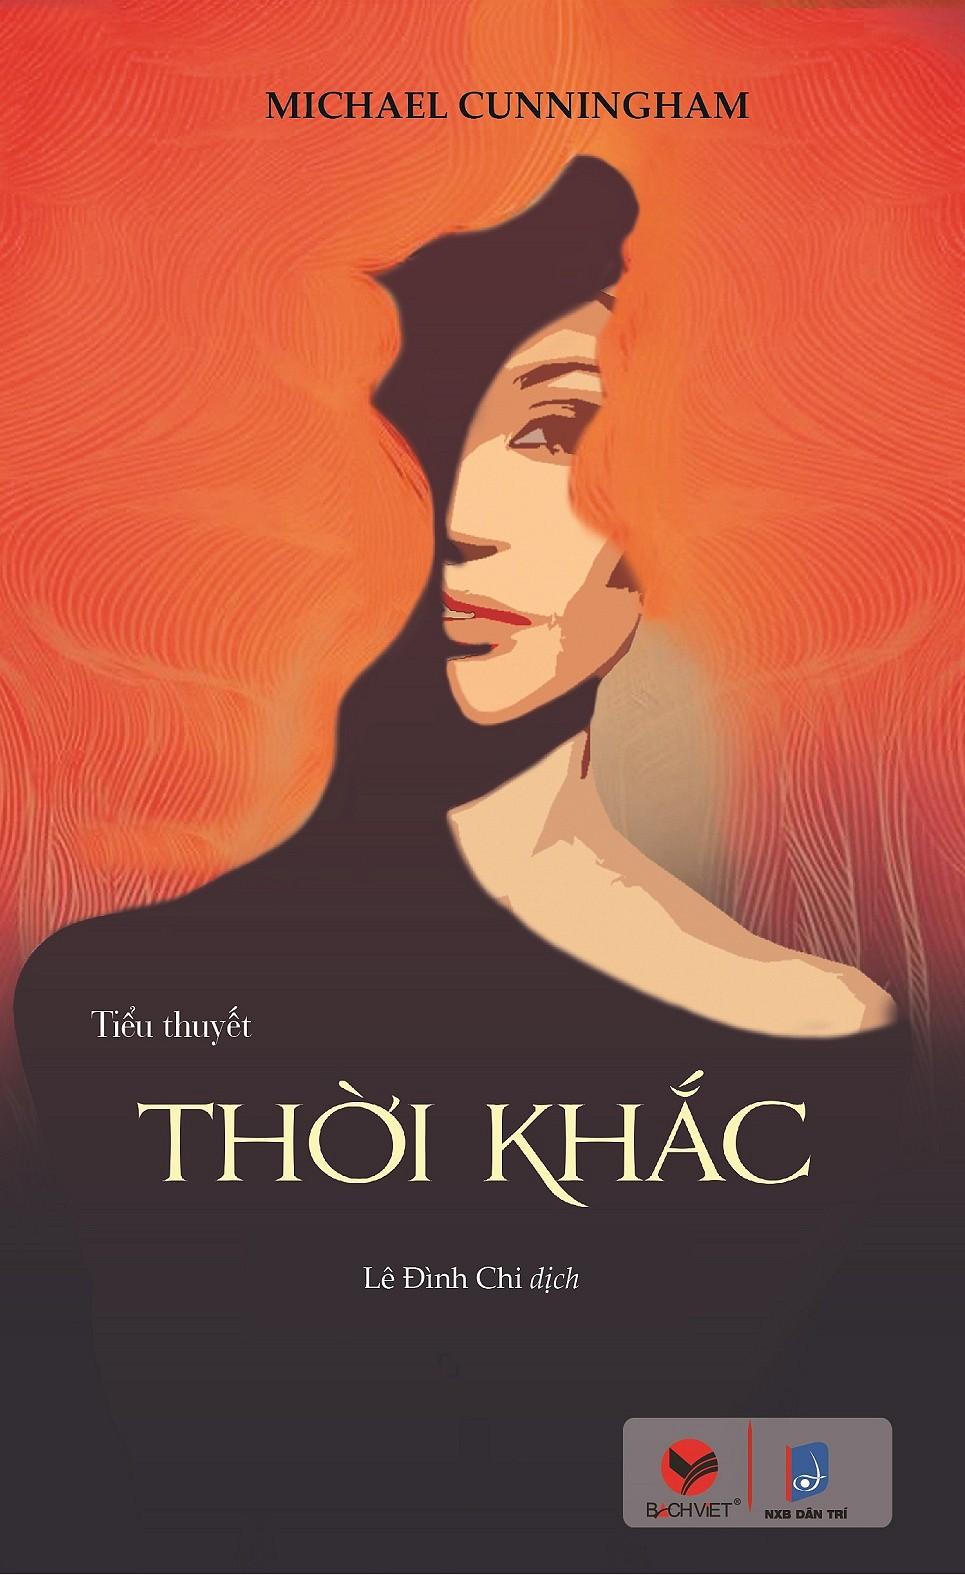 bia-1_thoi-khac.u547.d20160922.t112620.196928_1.jpg